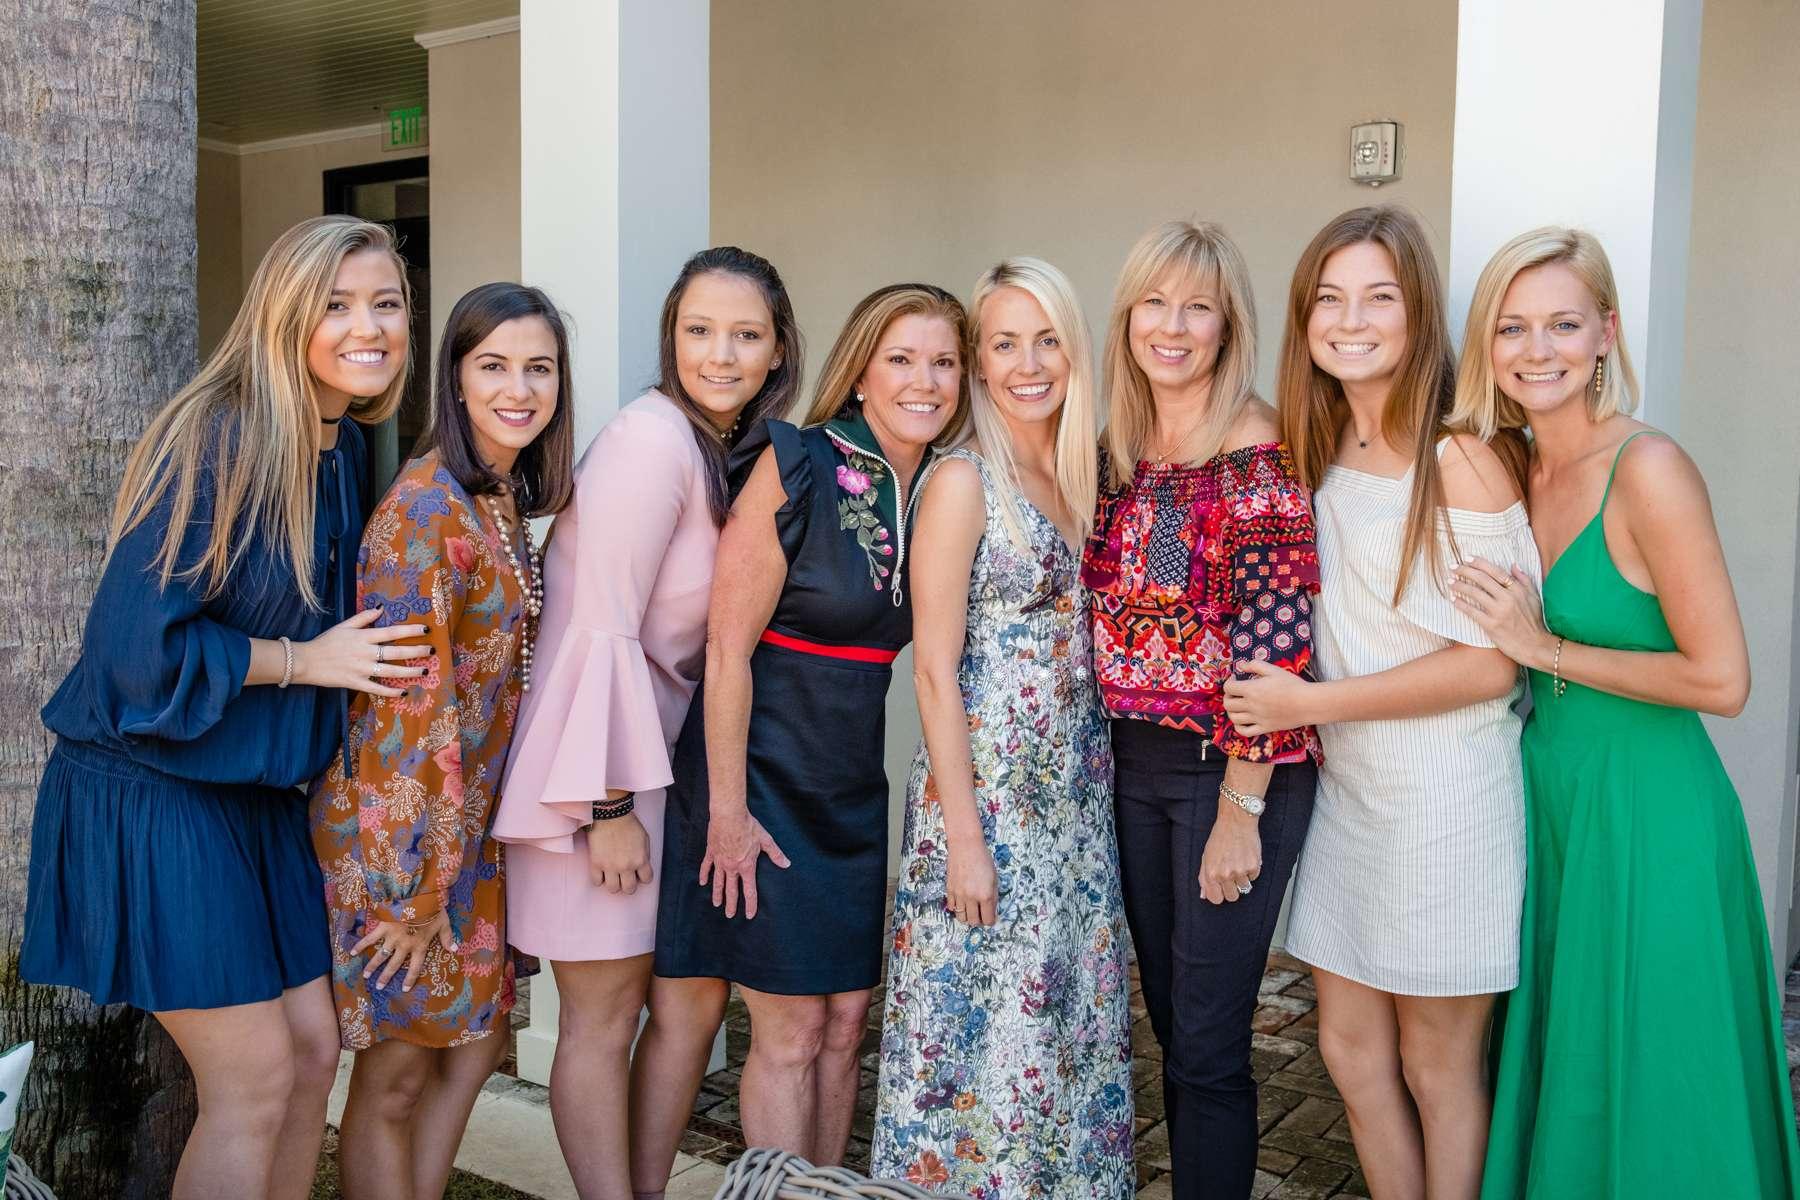 a1cbcf792811 ... Jillian Attaway s family celebrating at her bridal shower    Rhyme    Reason ...